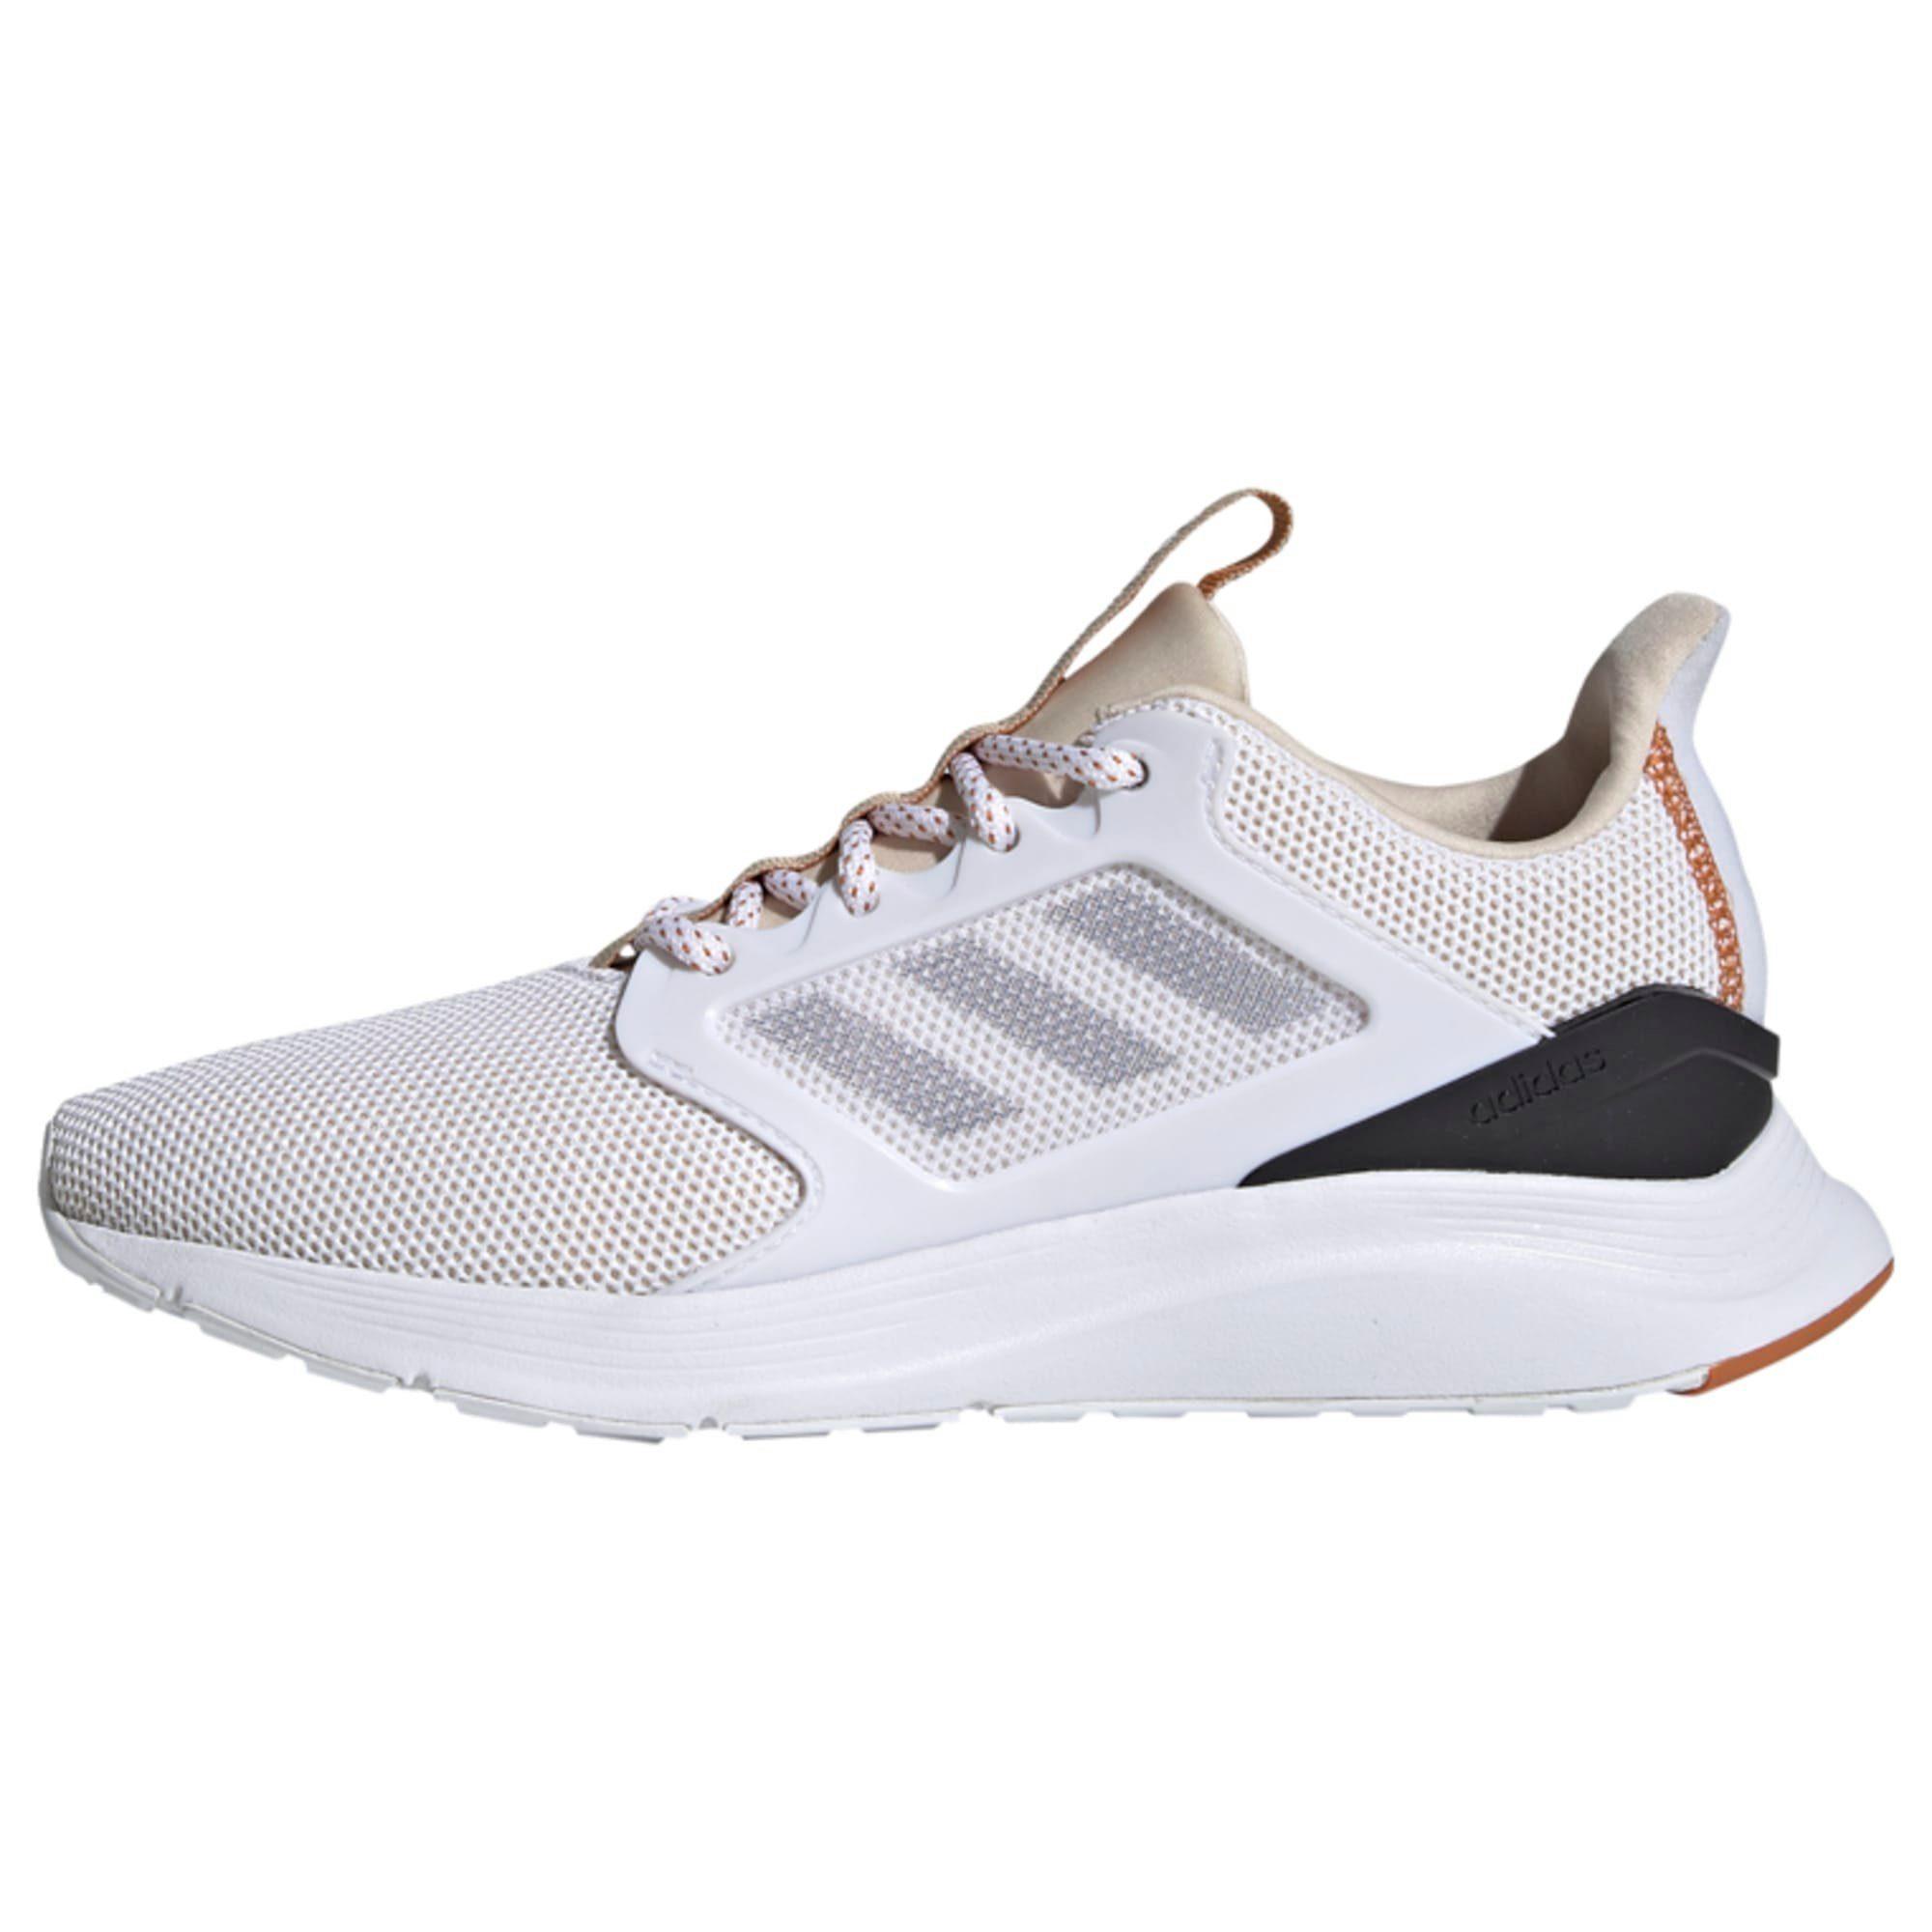 adidas OrthoLite® Sneaker Energyfalcon X, dämpfend